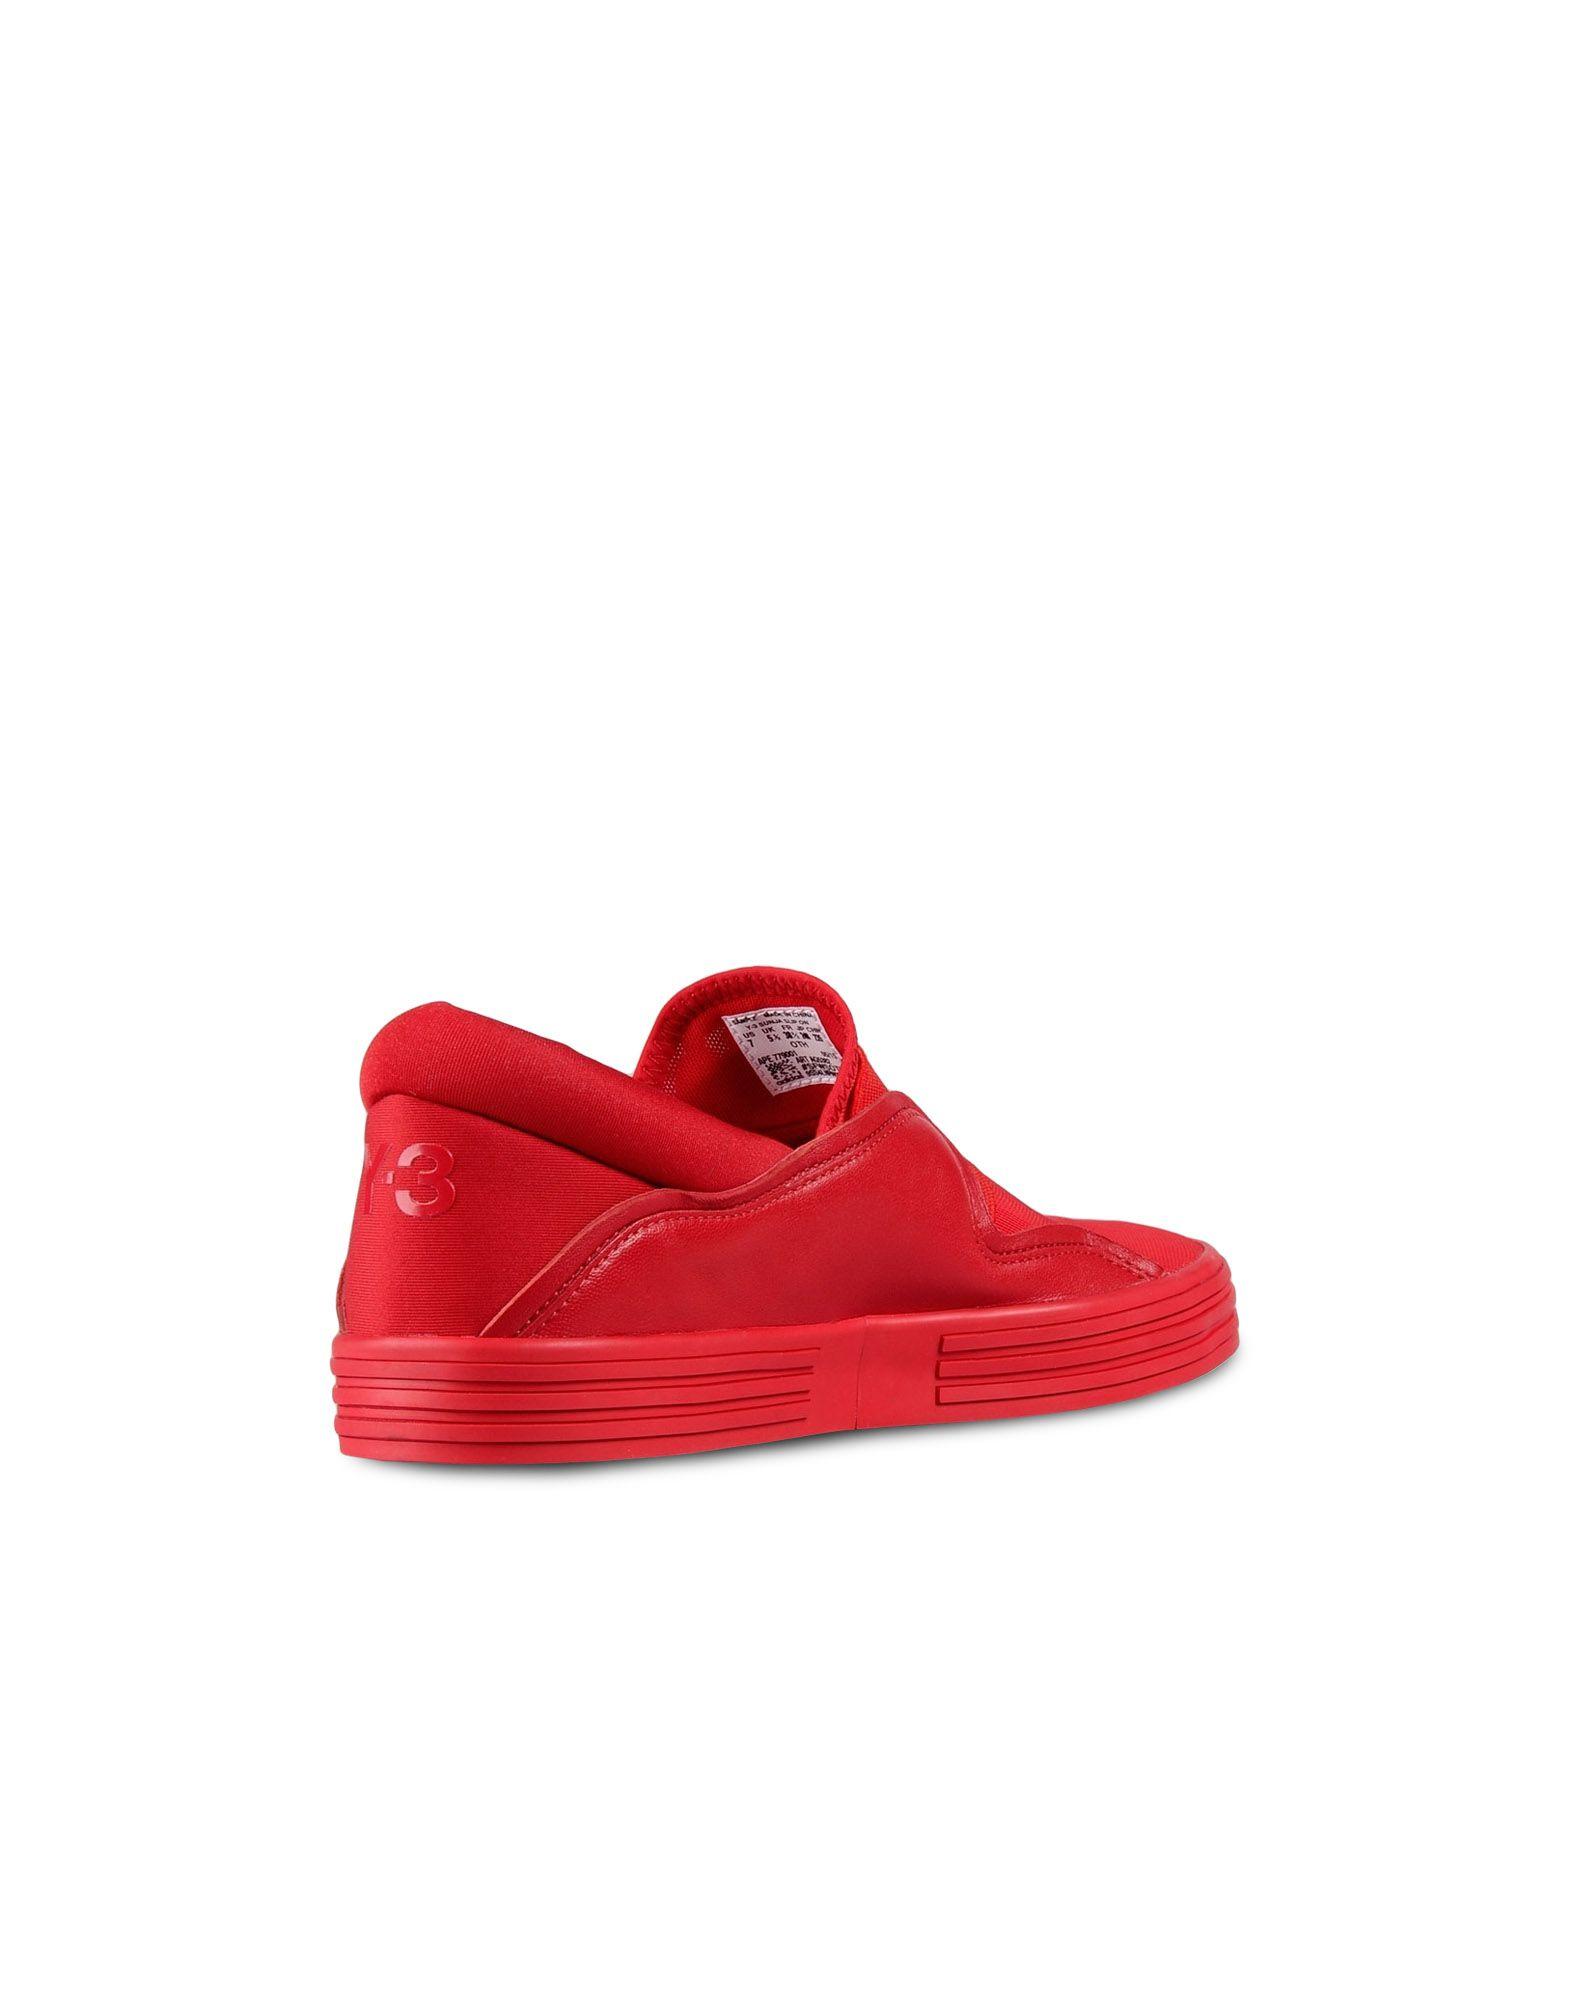 Buy cheap Online - adidas y3 women red 1ff7ded4f